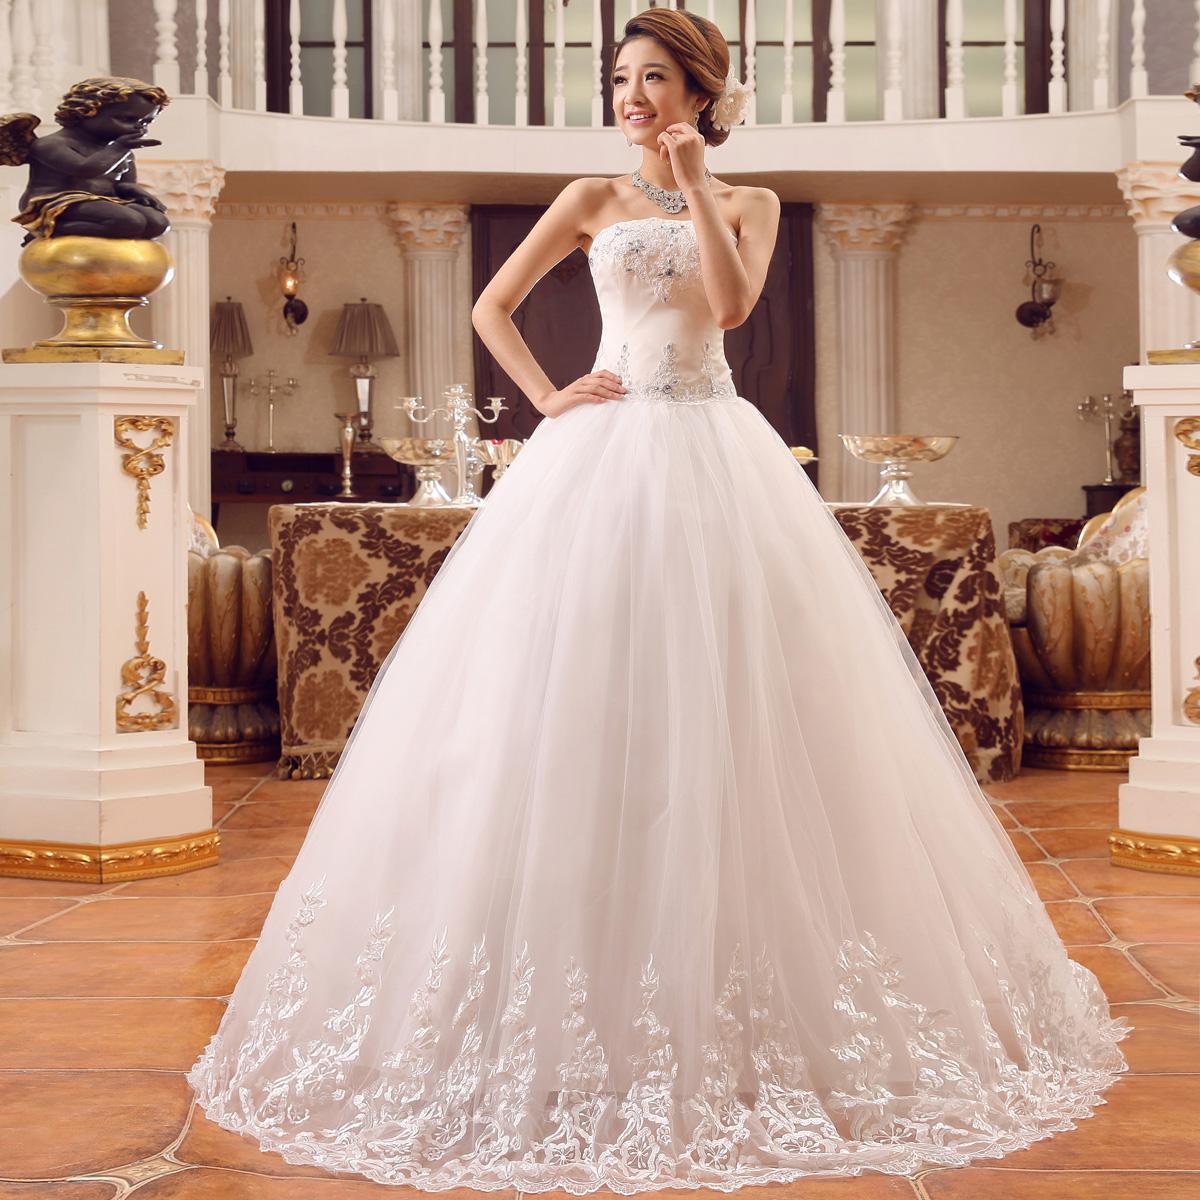 Fashion Wedding Dresses White Lace Embroidery Bow Waist